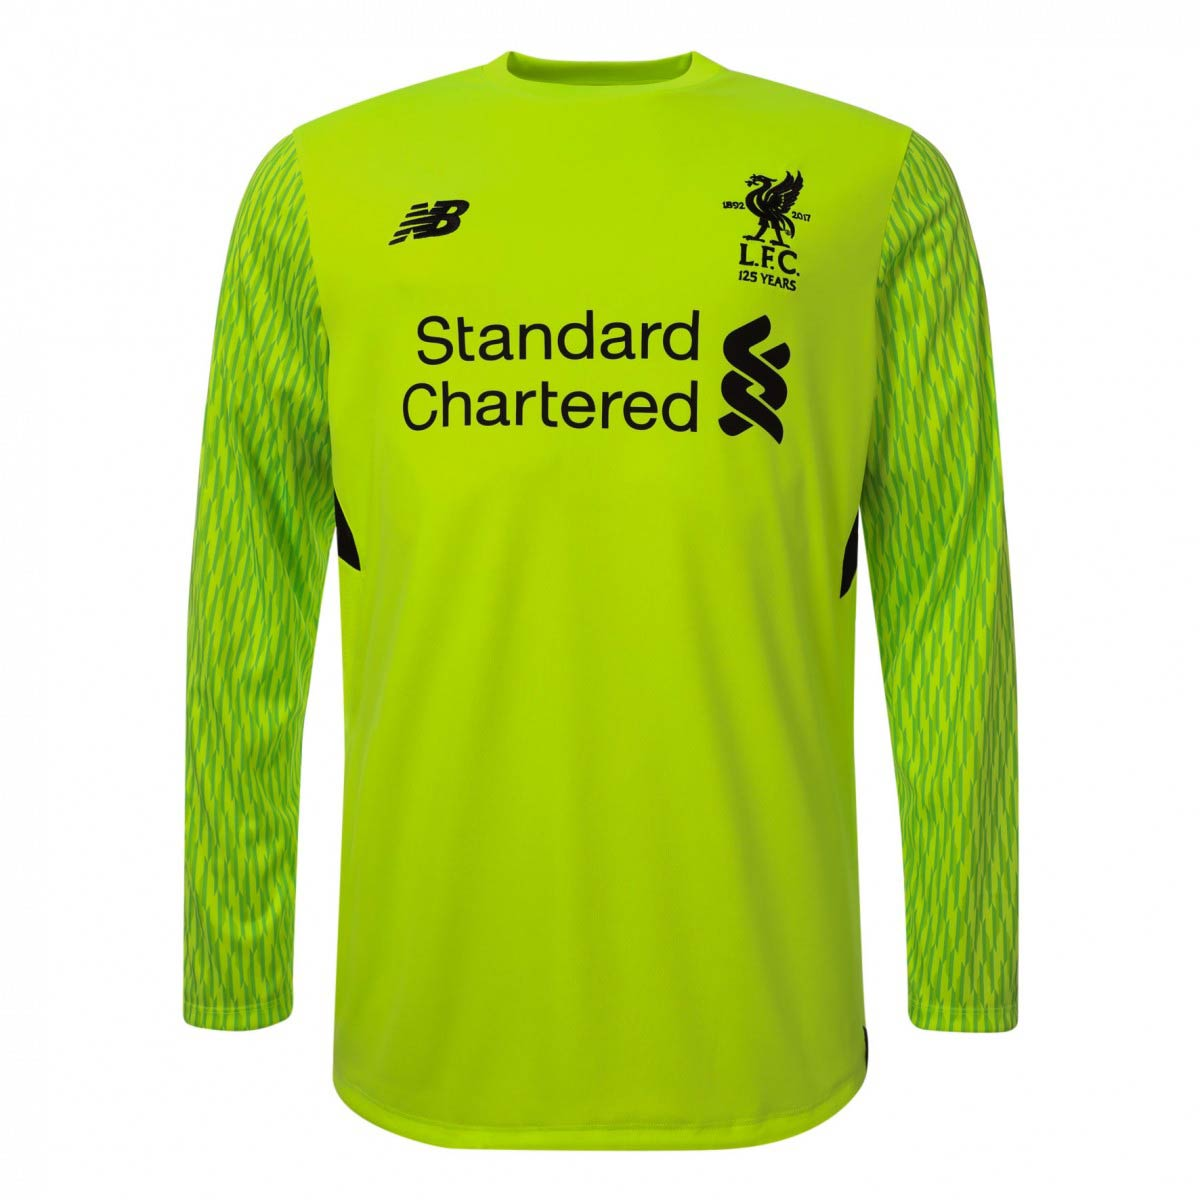 faf971ef9 Liverpool 2017-2018 Third GK Shirt (Green)  MT739010  -  72.05 ...